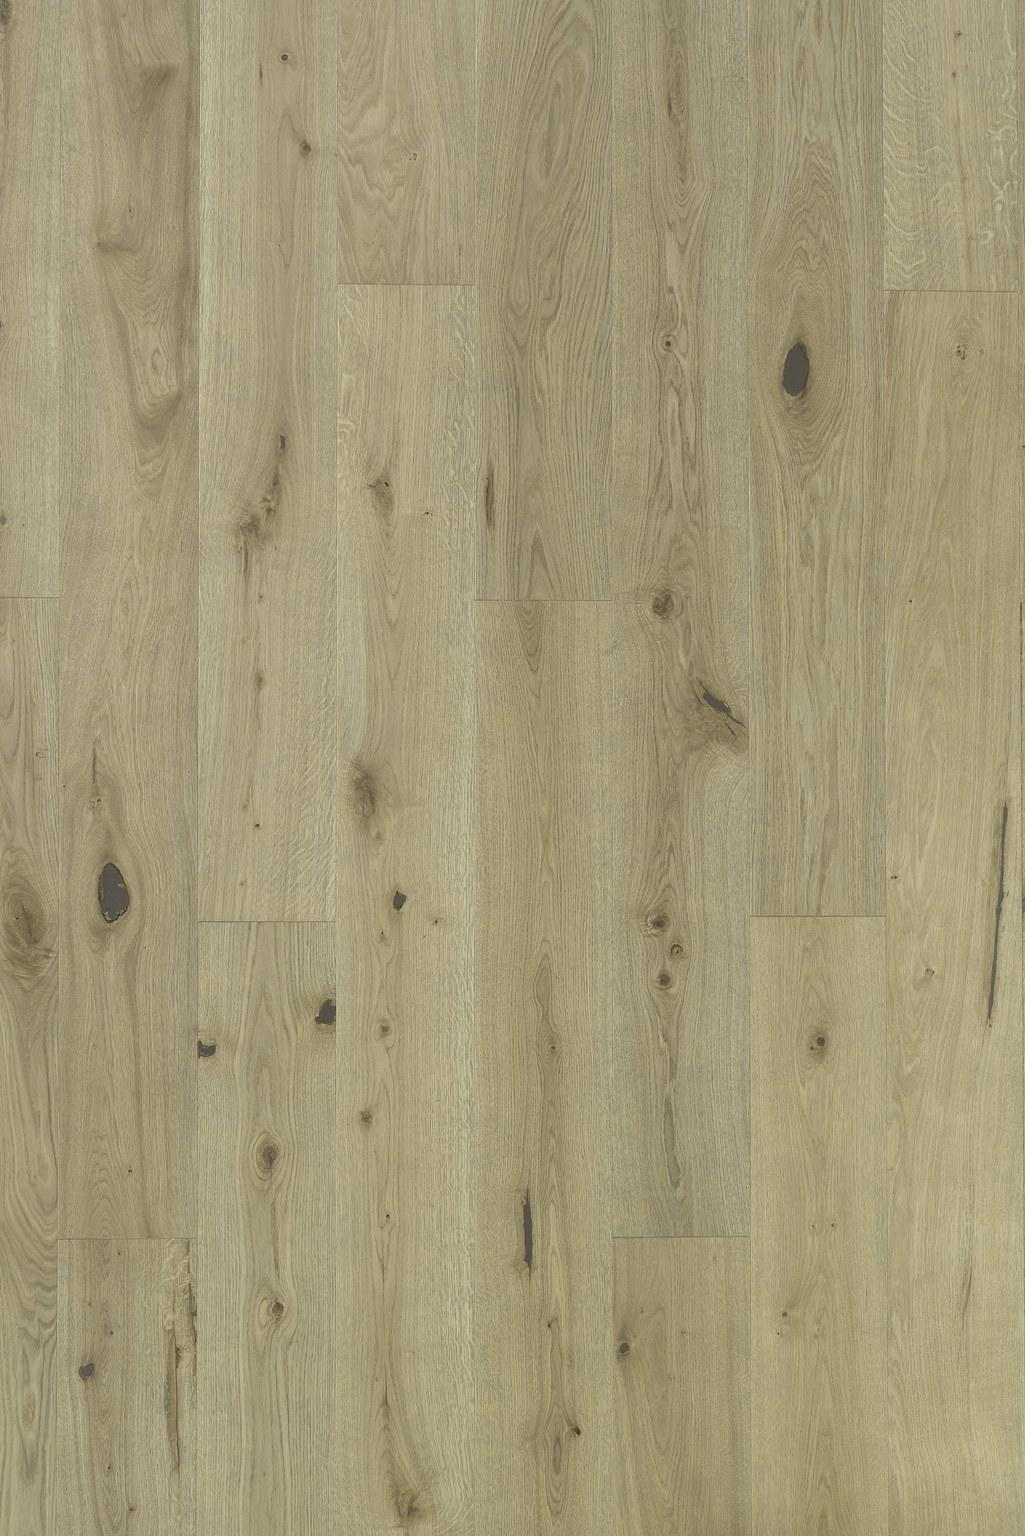 Timberwise parketti lankkuparketti puulattia wooden floor parquet plank Tammi Oak Vintage Ruka_2D1